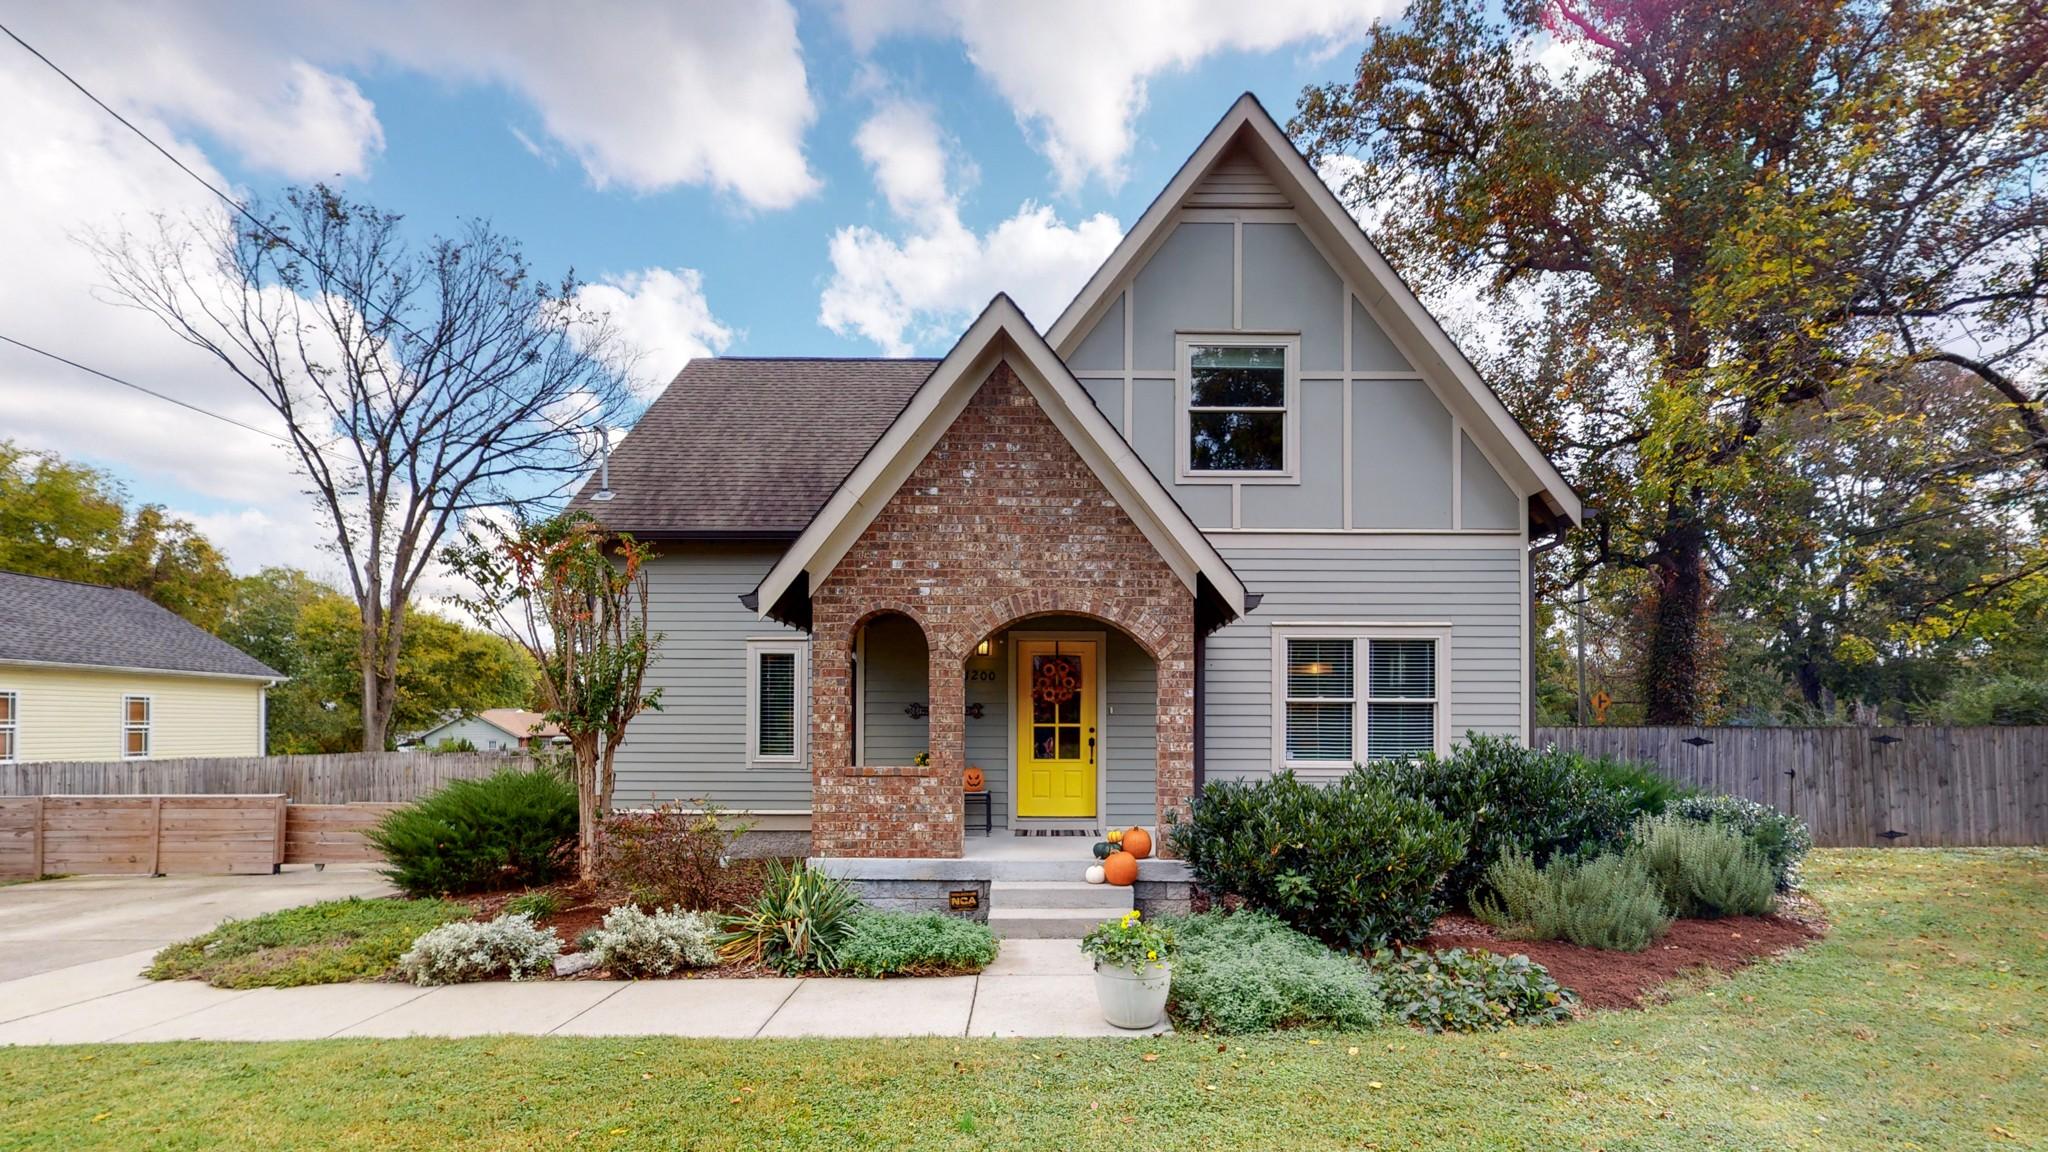 1200 Kenmore Pl Property Photo - Nashville, TN real estate listing